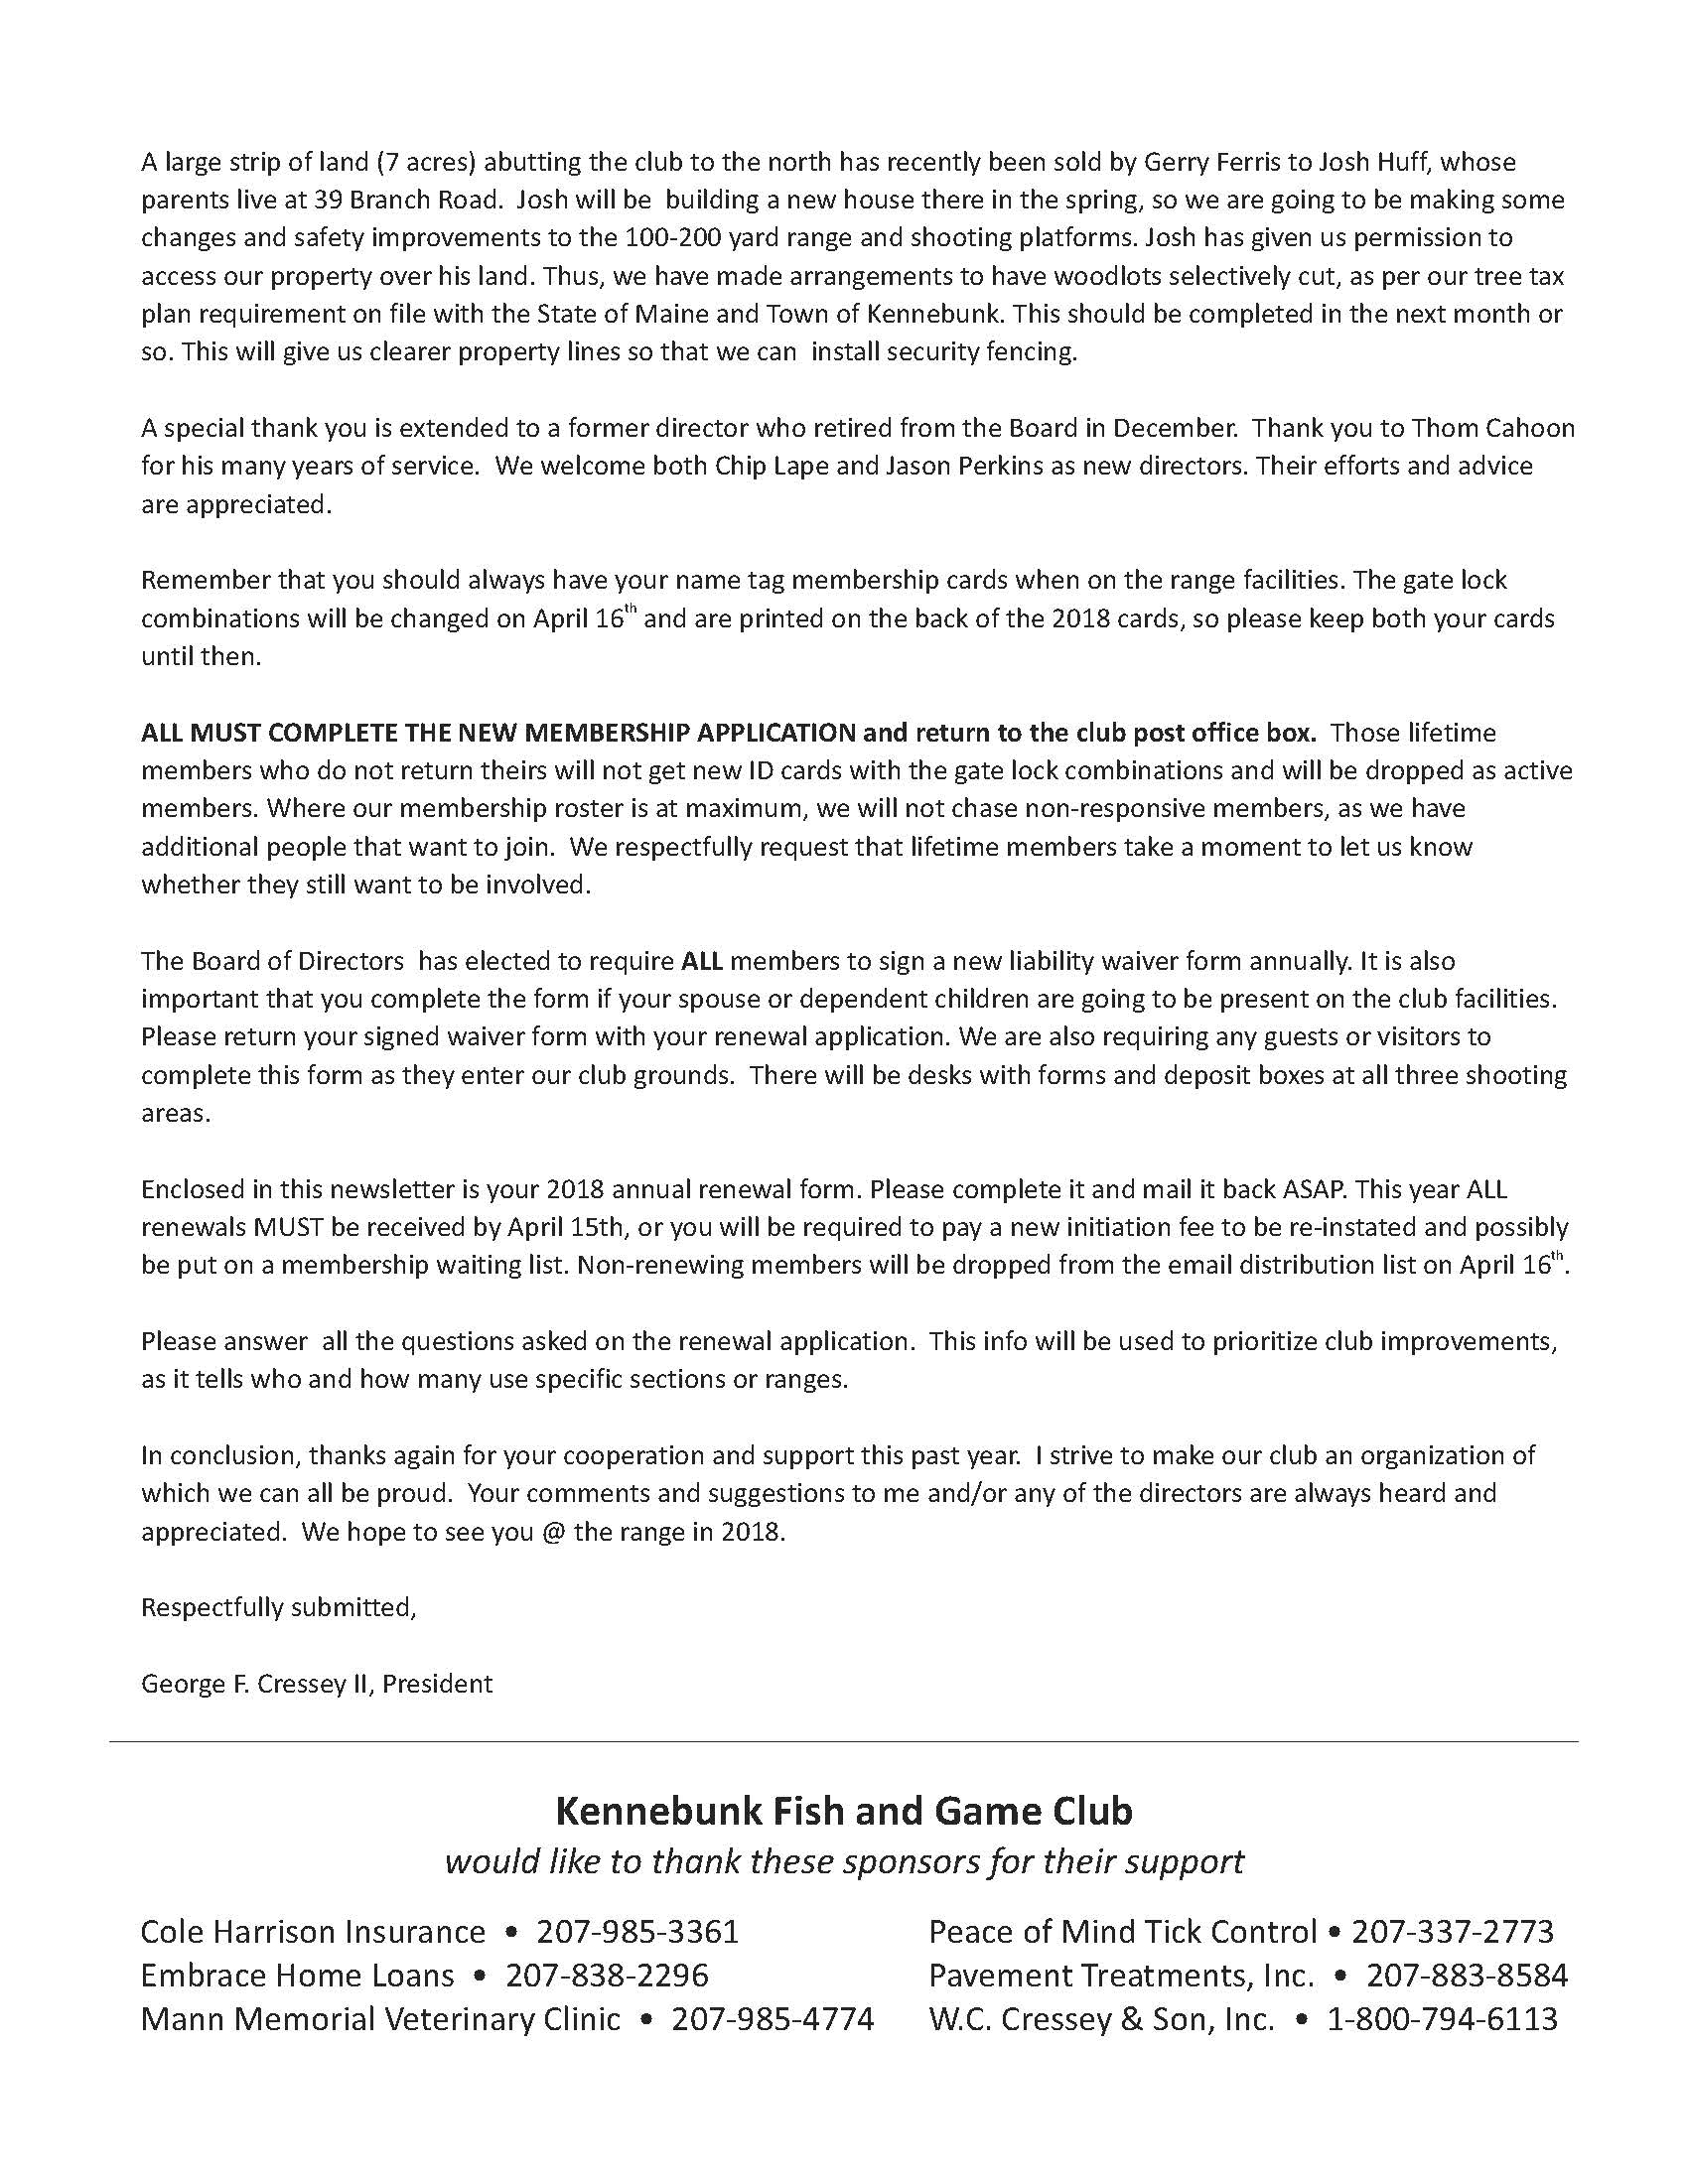 Kennebunk Fish & Game 2018  Newsletter 021218_Page_2.jpg